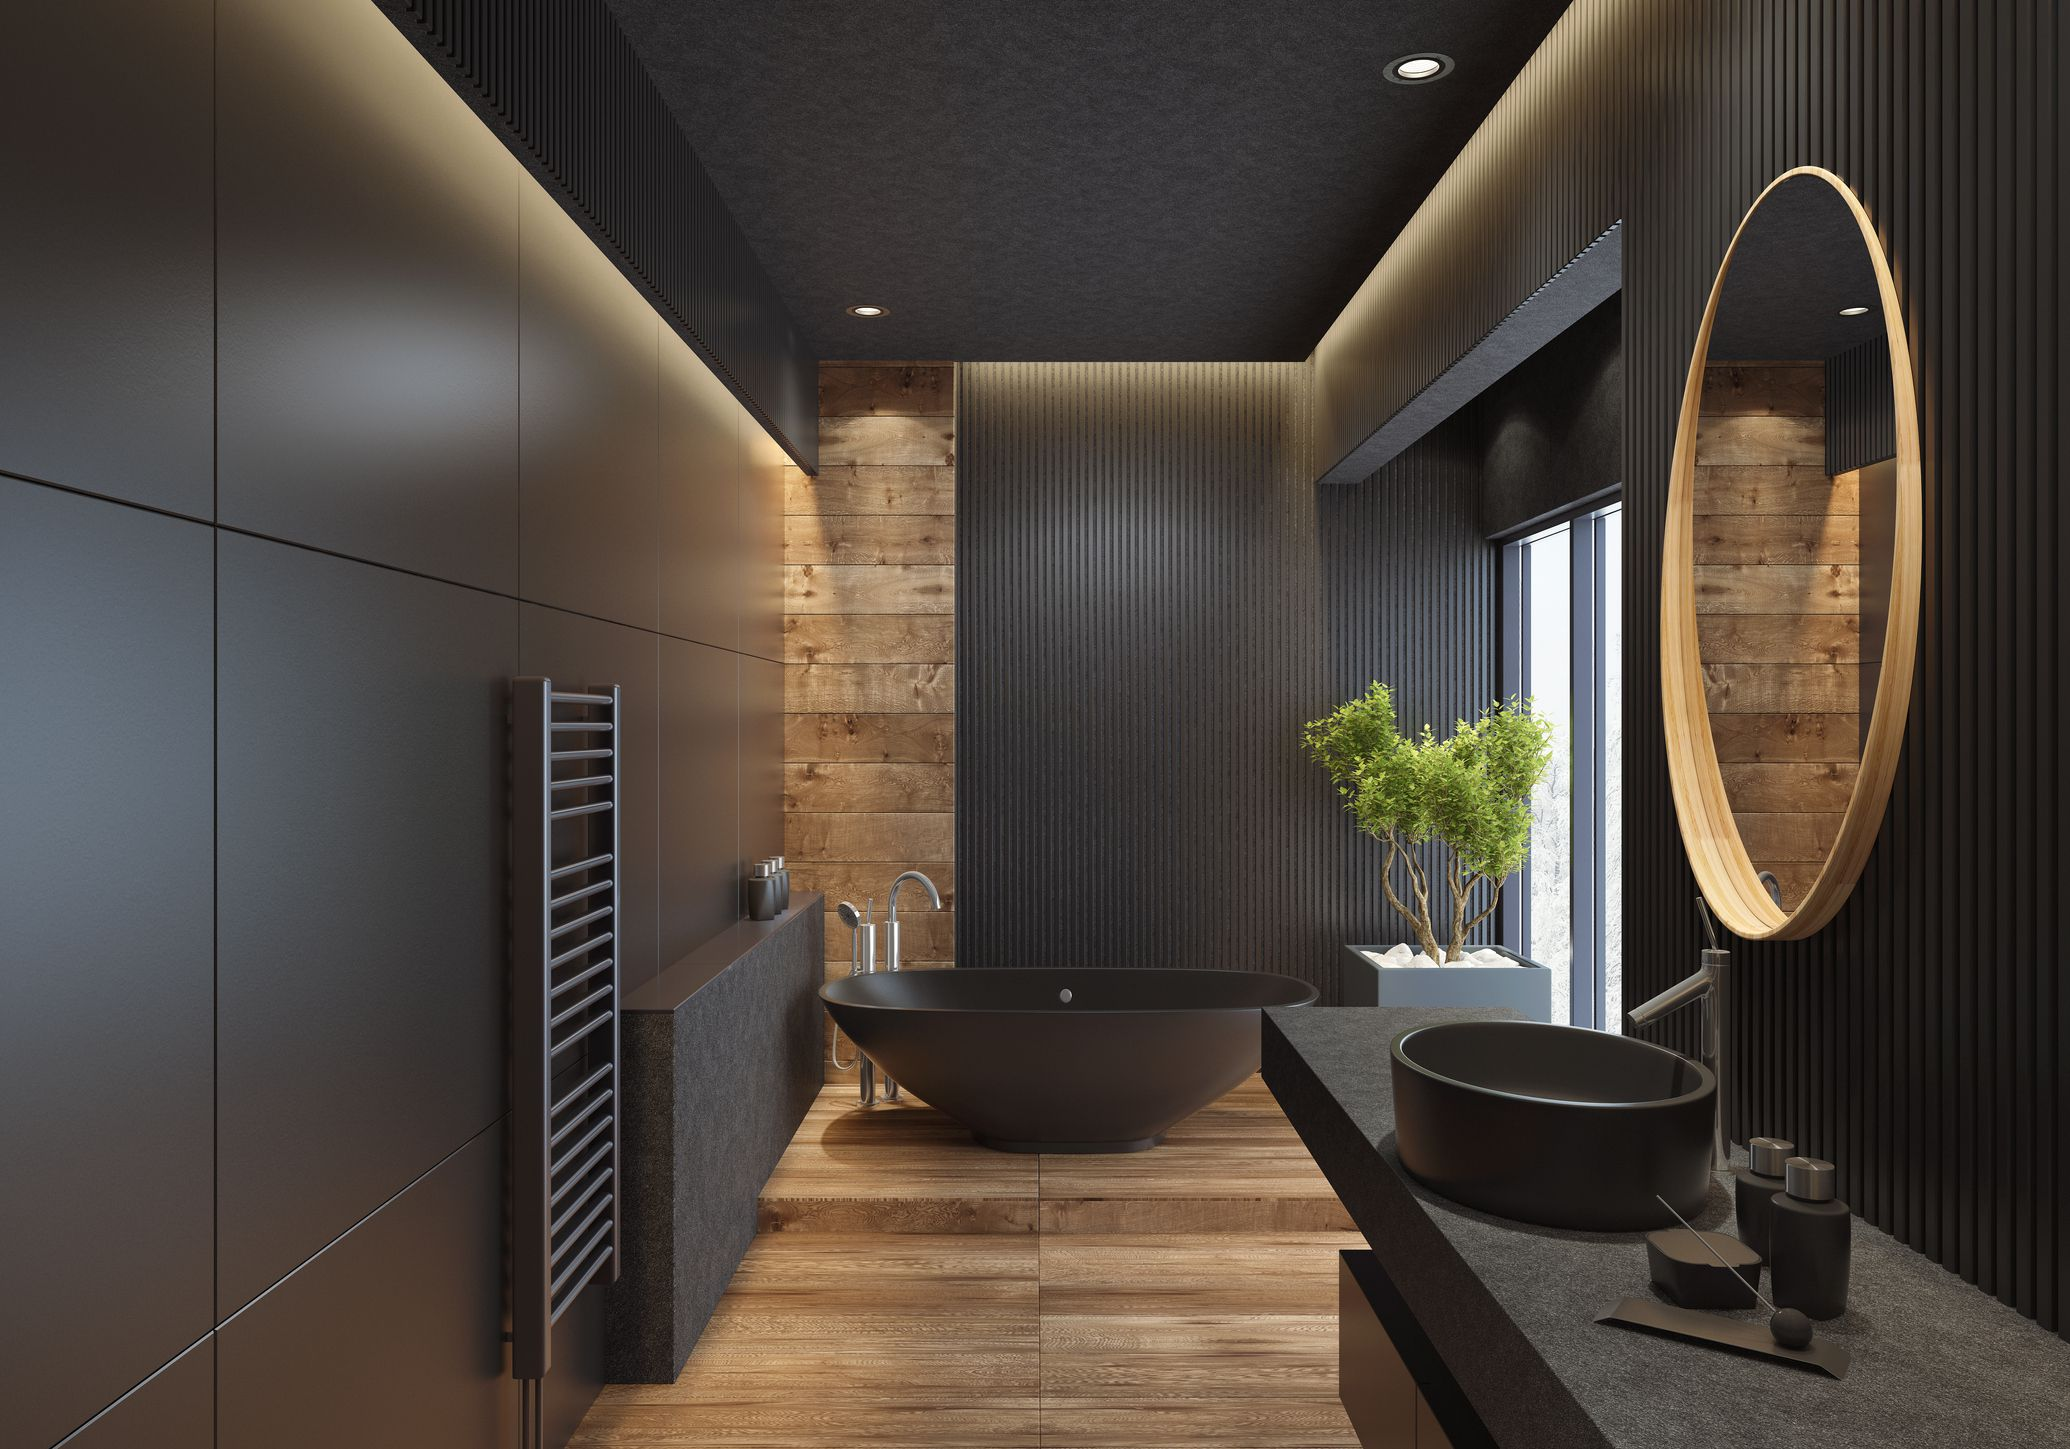 5 Gorgeous Scandinavian Bathroom Ideas: 11 Ideas For Scandinavian-Style Bathrooms